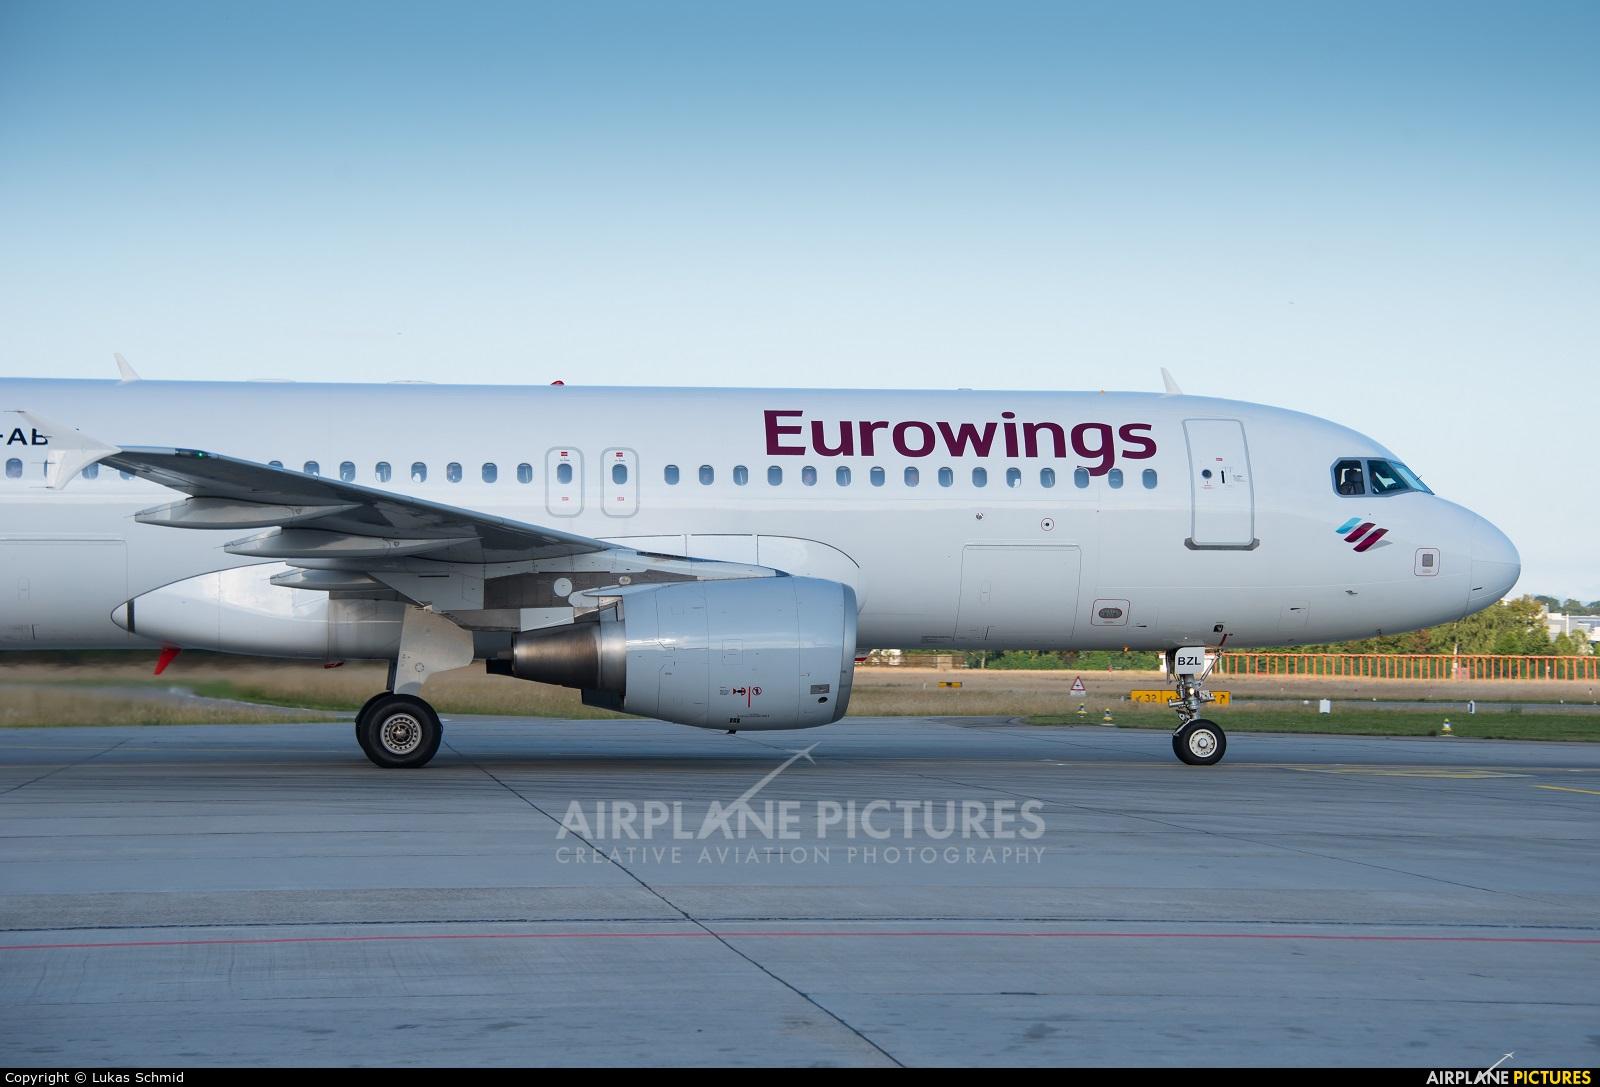 Eurowings D-ABZL aircraft at Zurich